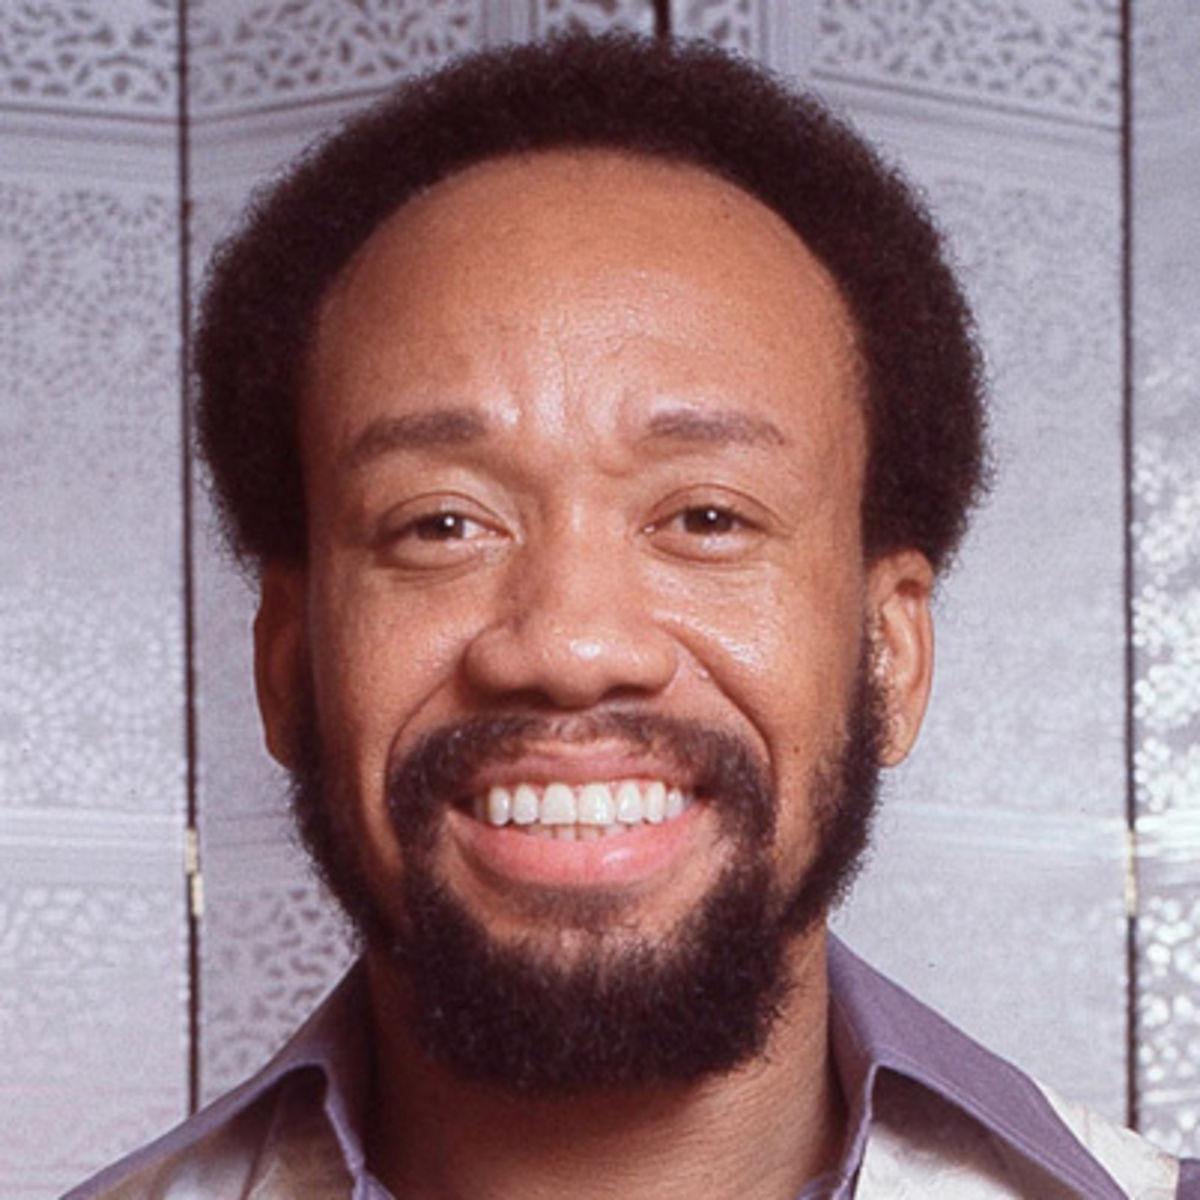 R.I.P Maurice White